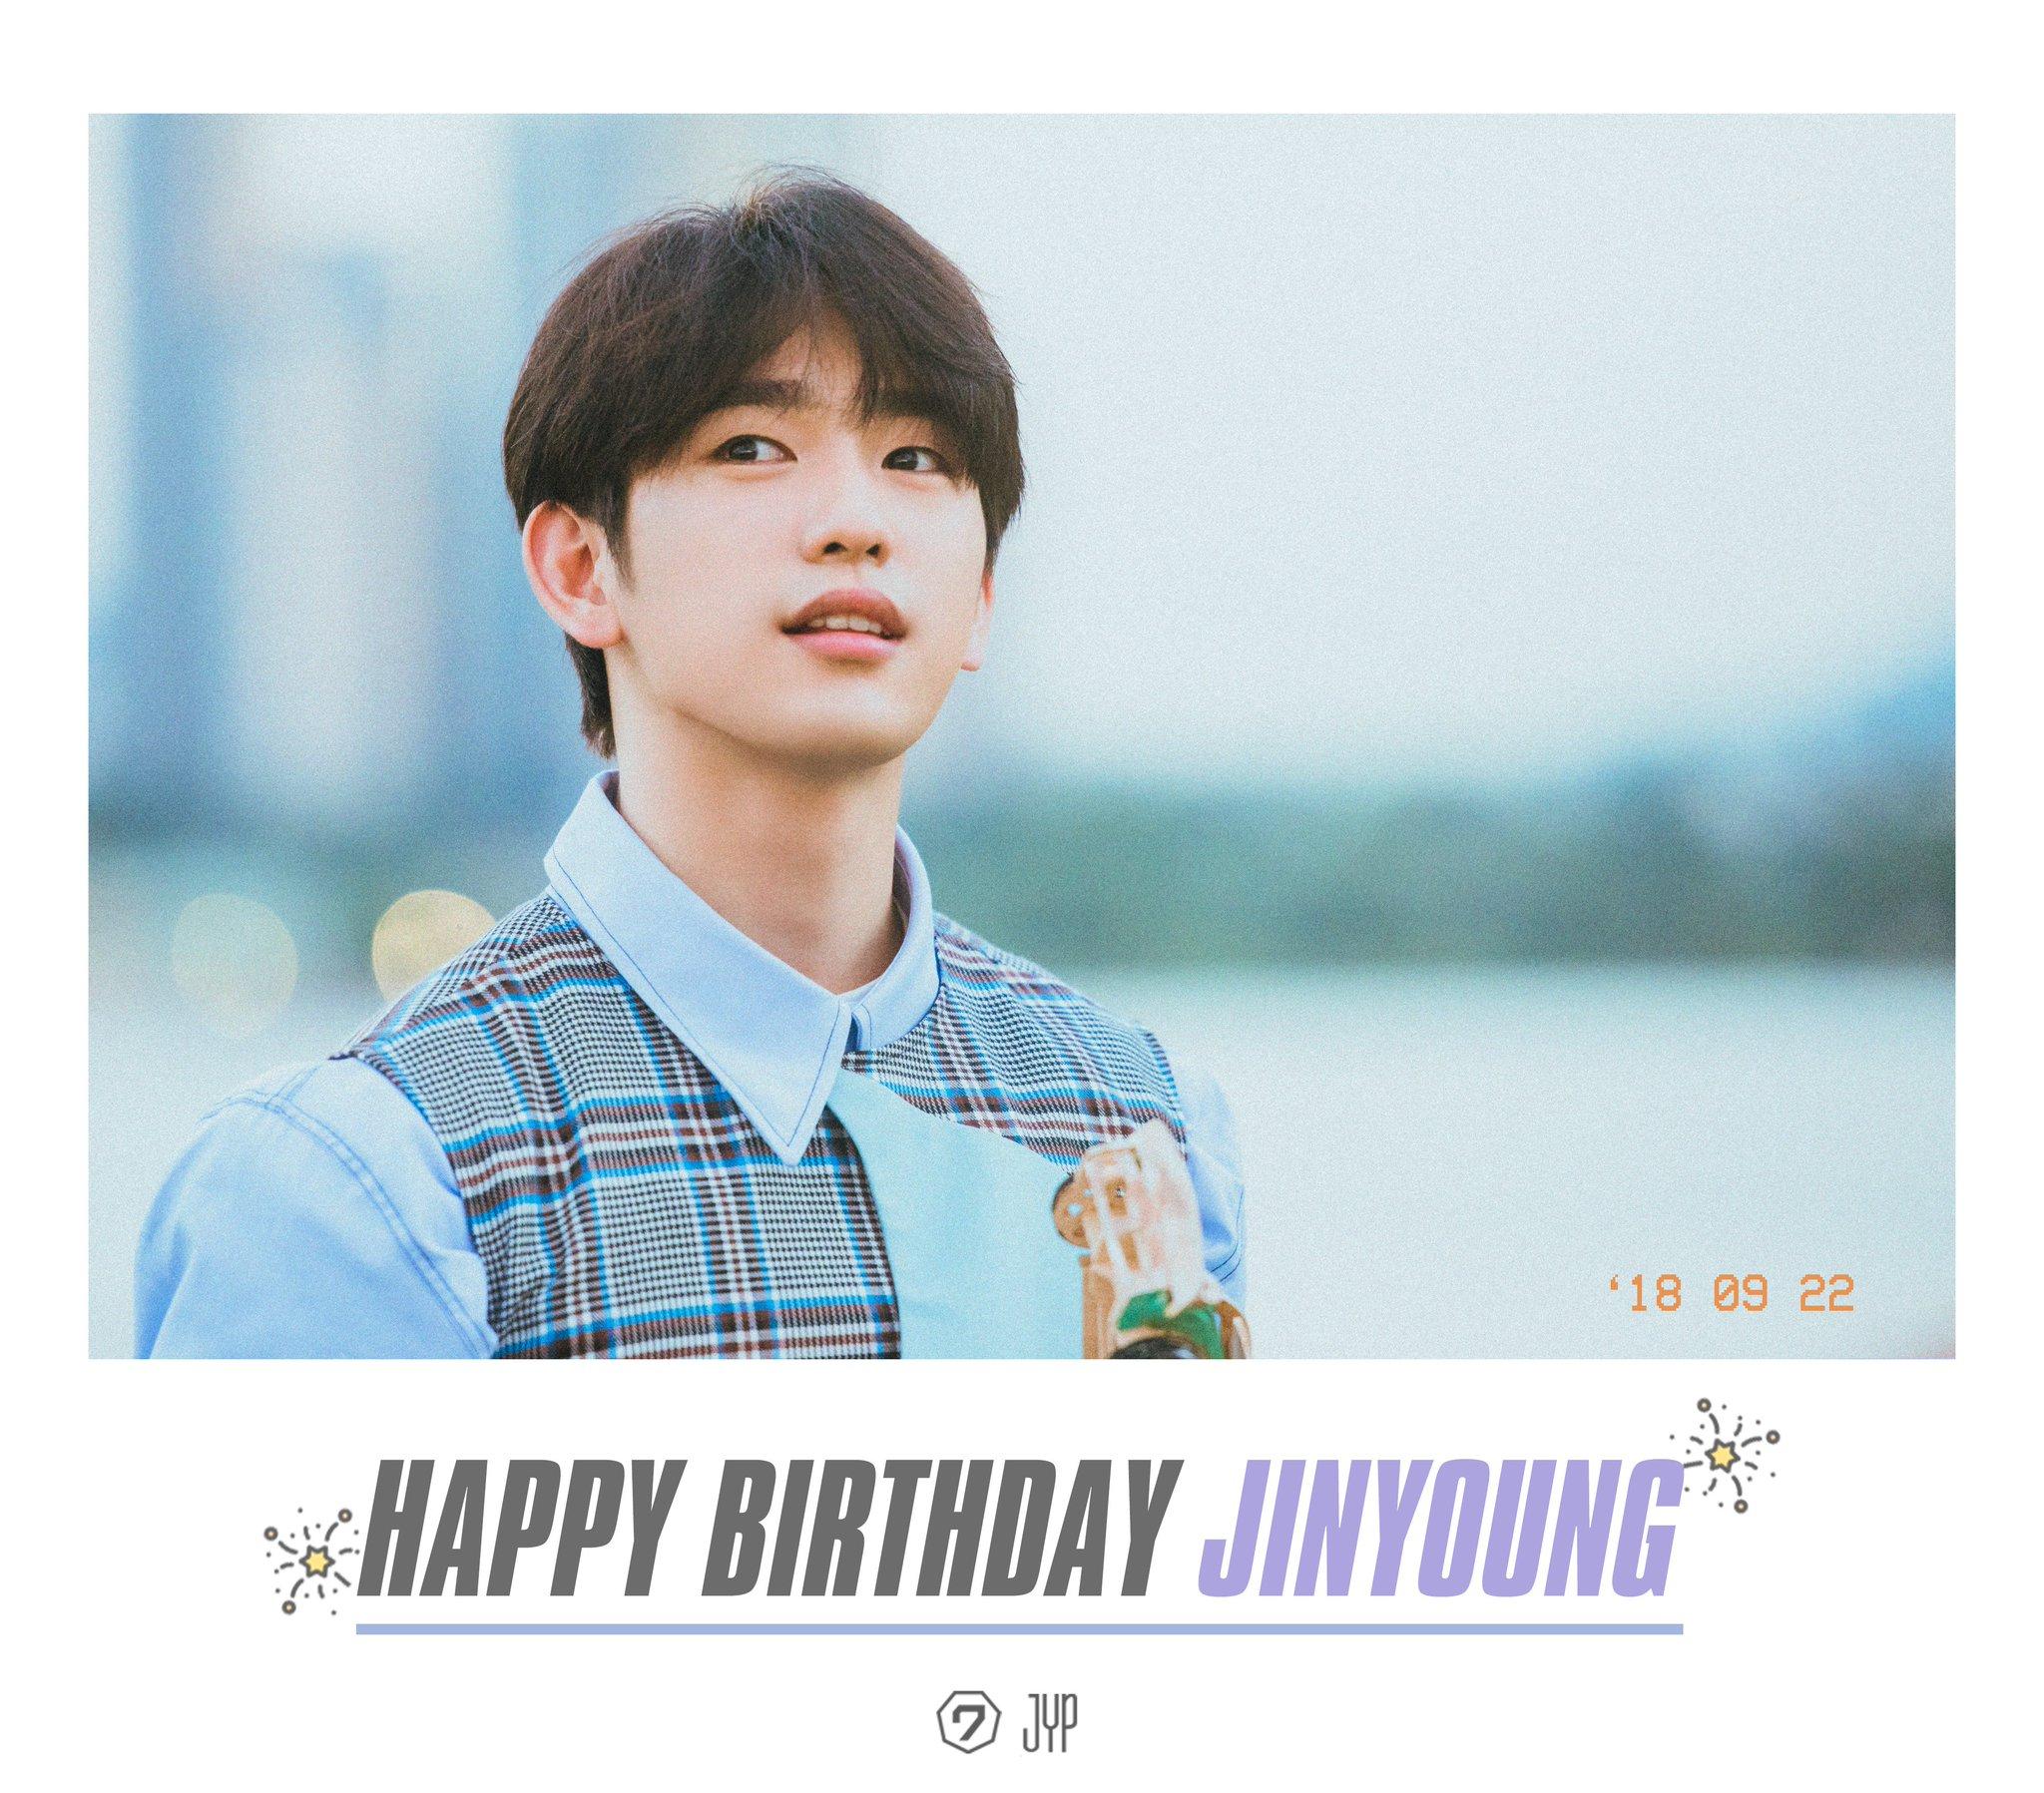 HAPPY BIRTHDAY Jinyoung  #MyYouthJinyoungDay https://t.co/0YYf64vUlH